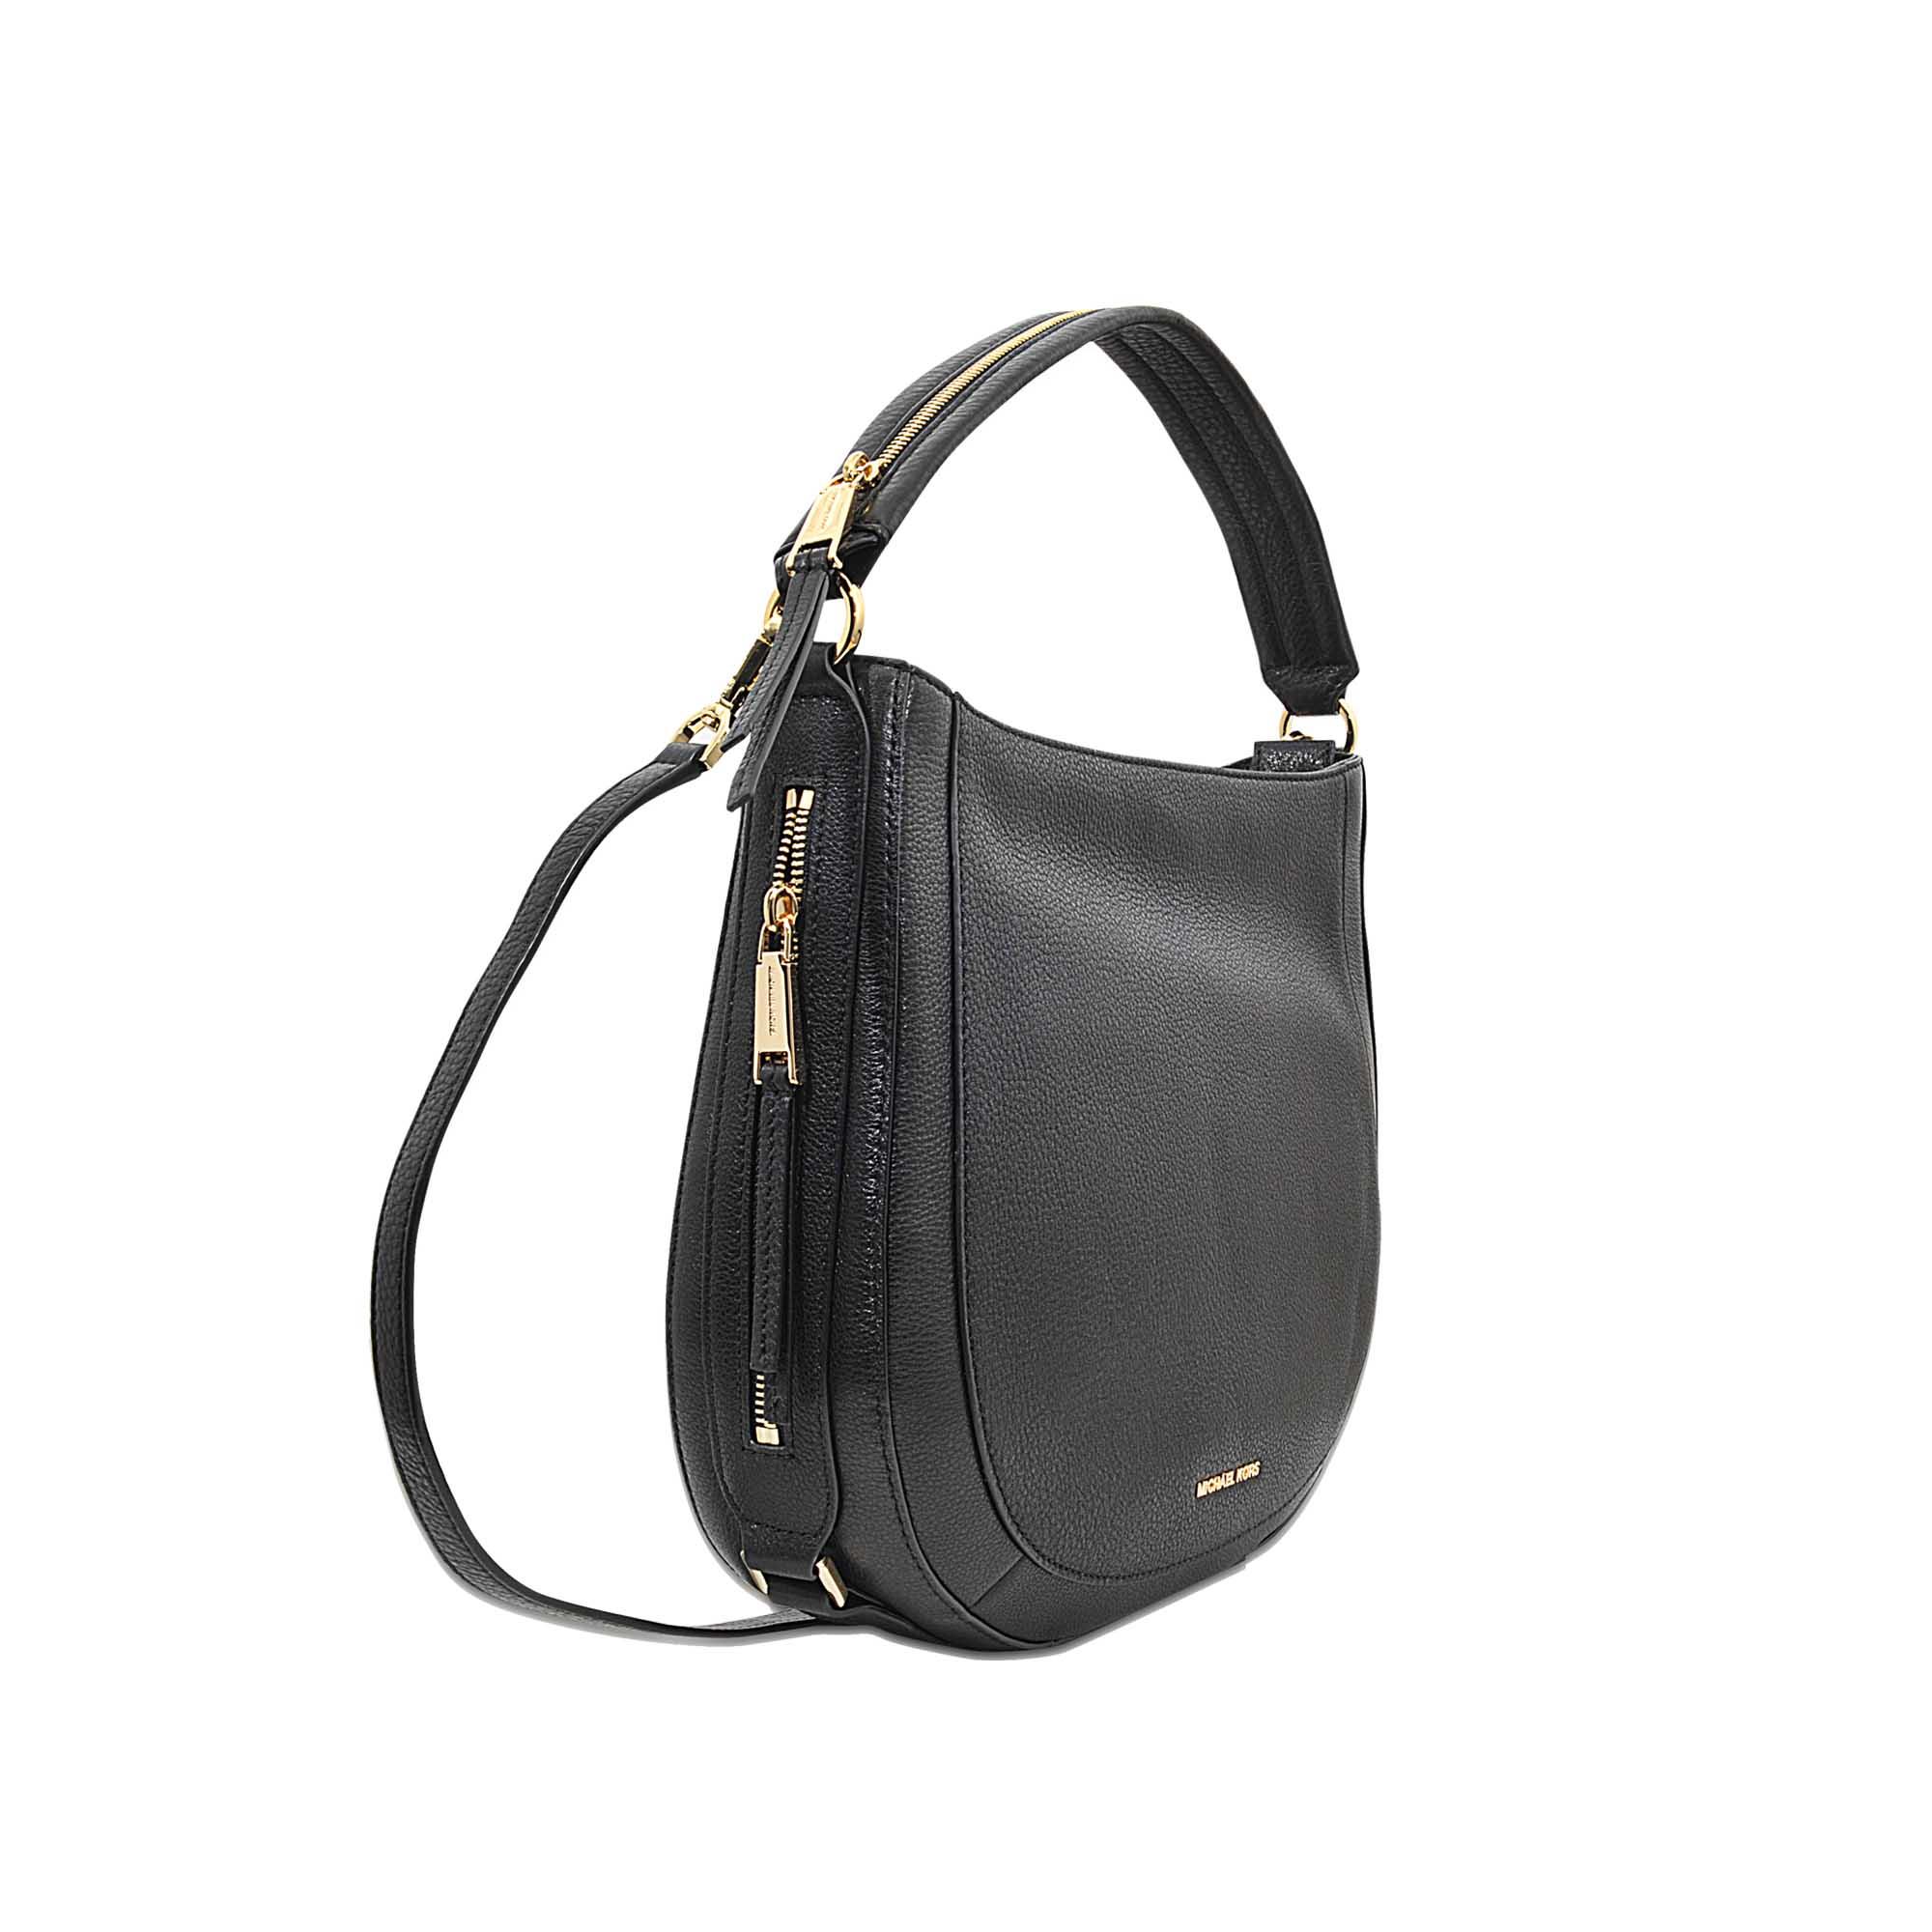 ce331b93bcdb MICHAEL Michael Kors Julia Medium Congreenible Shoulder Bag in Black ...